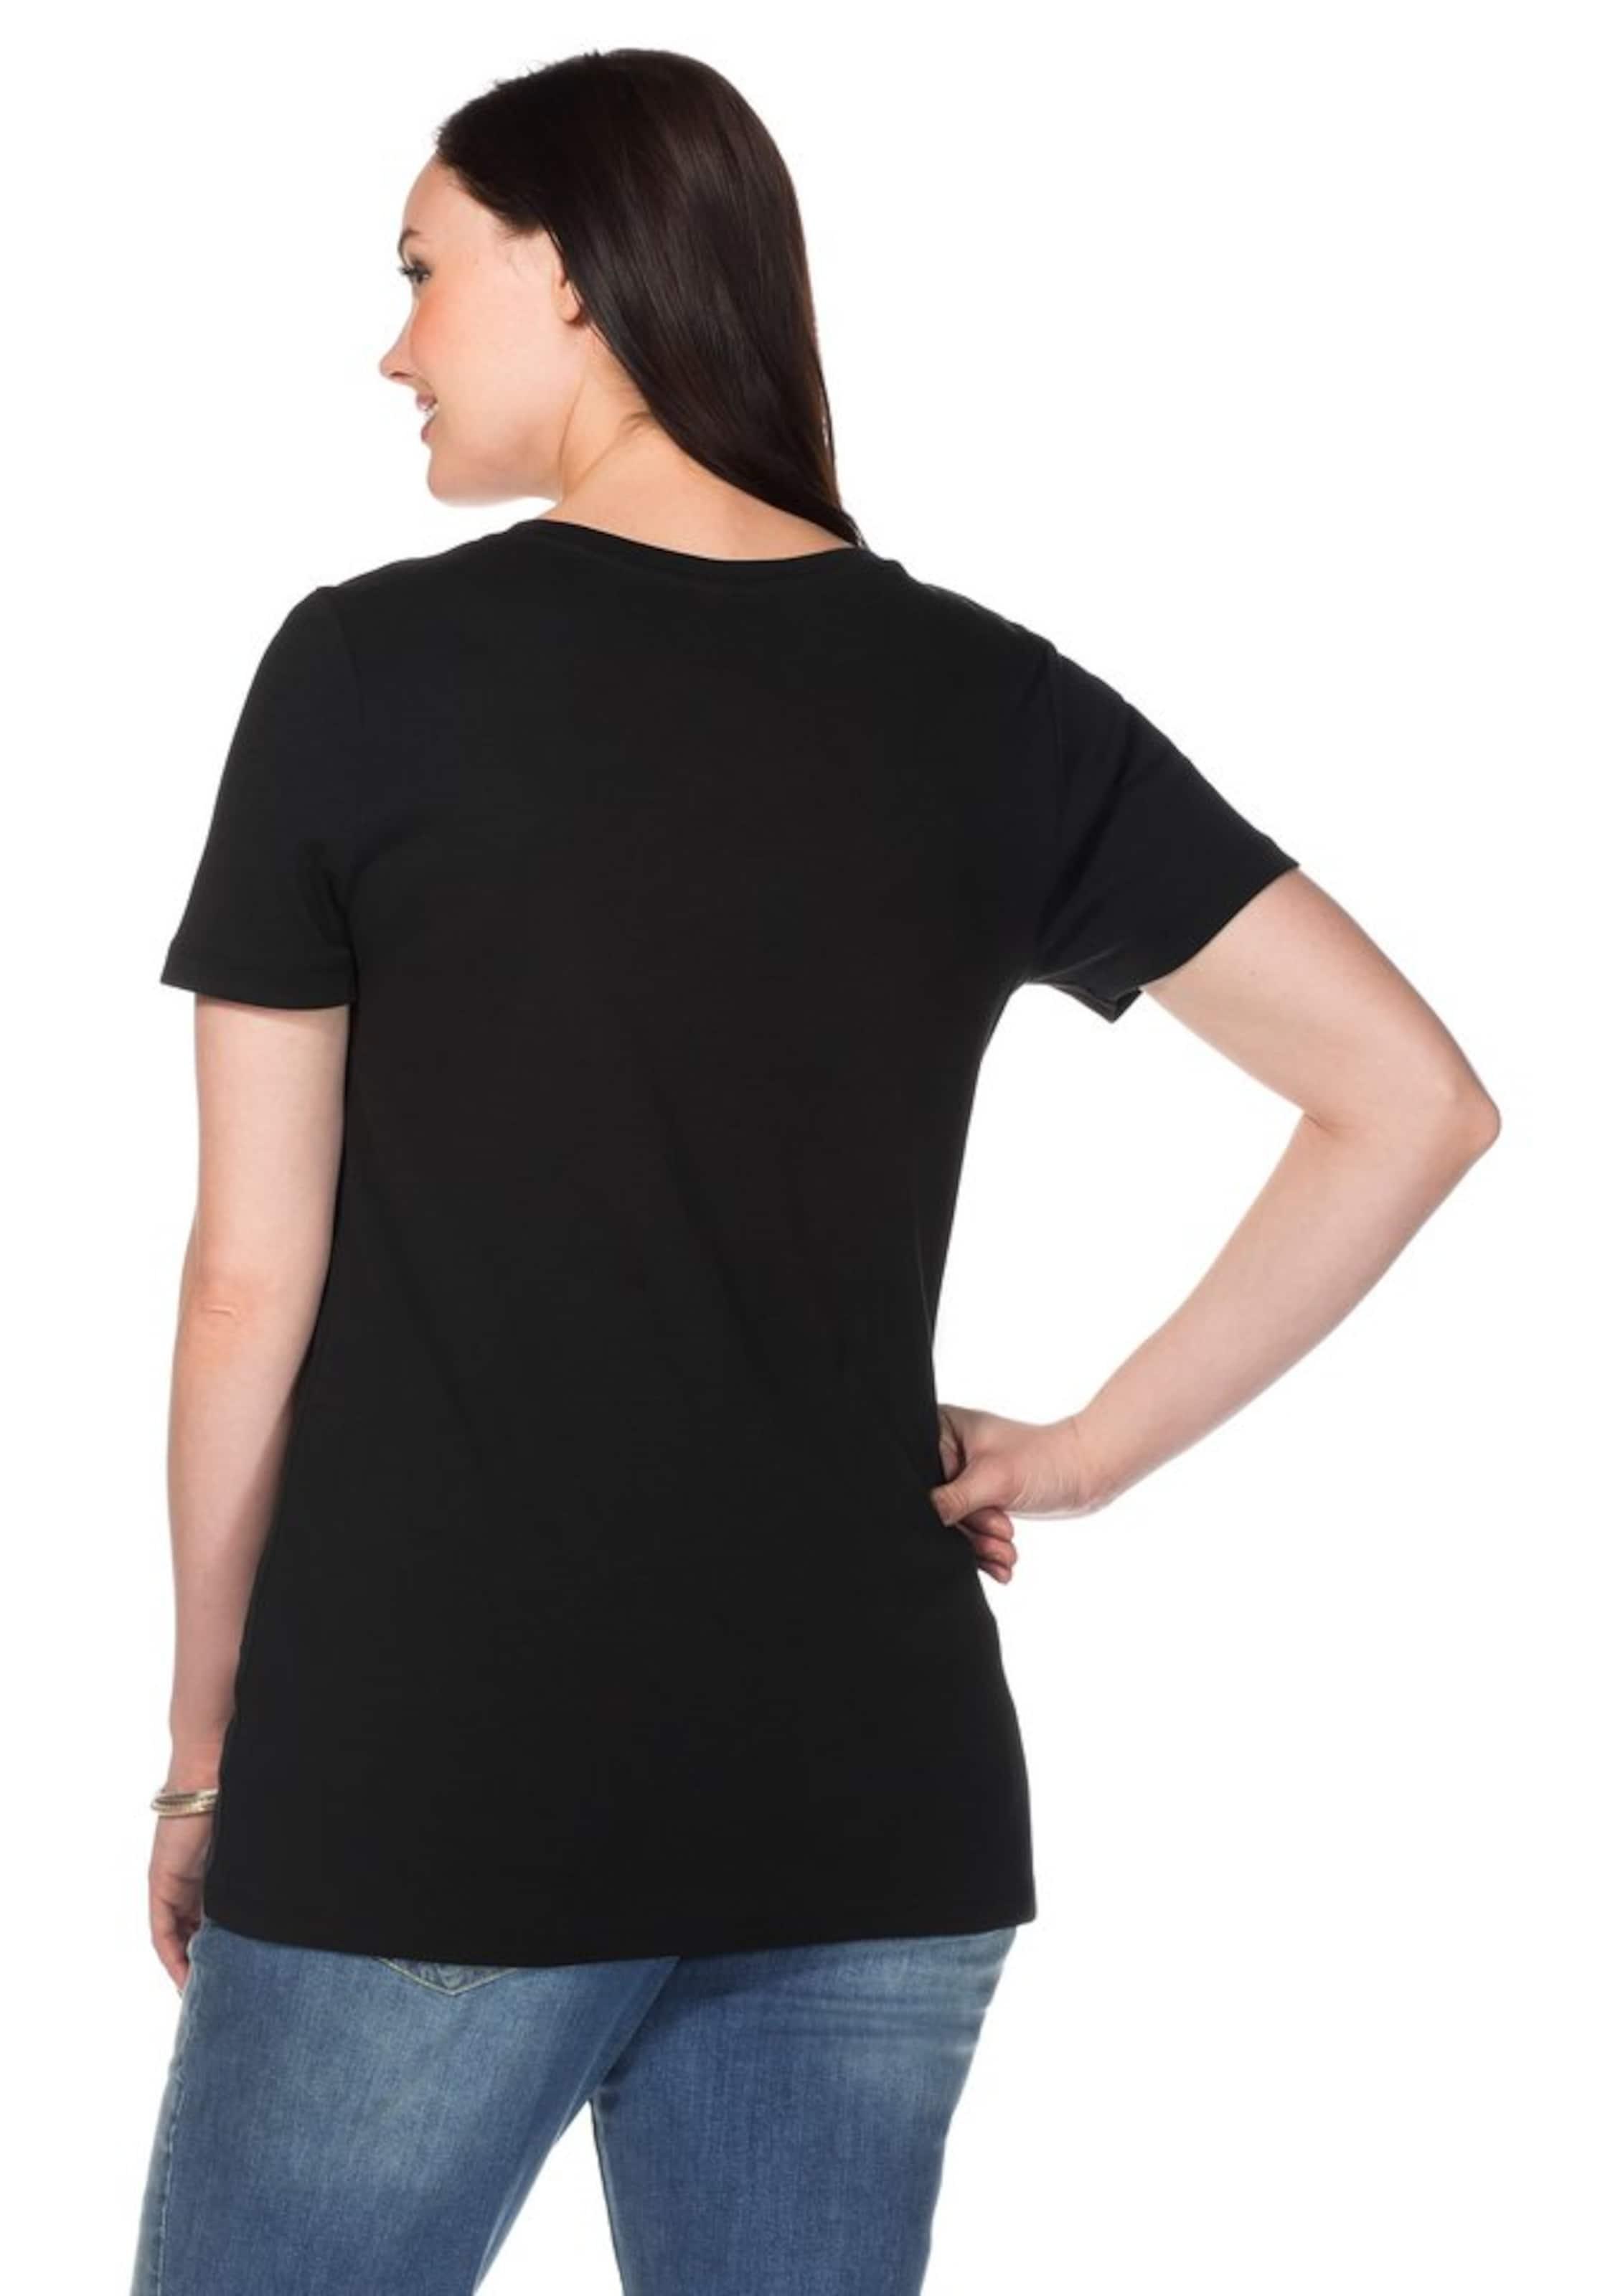 Sheego In T shirt Sheego Sheego Schwarz Schwarz In T shirt rCxoQEdBeW